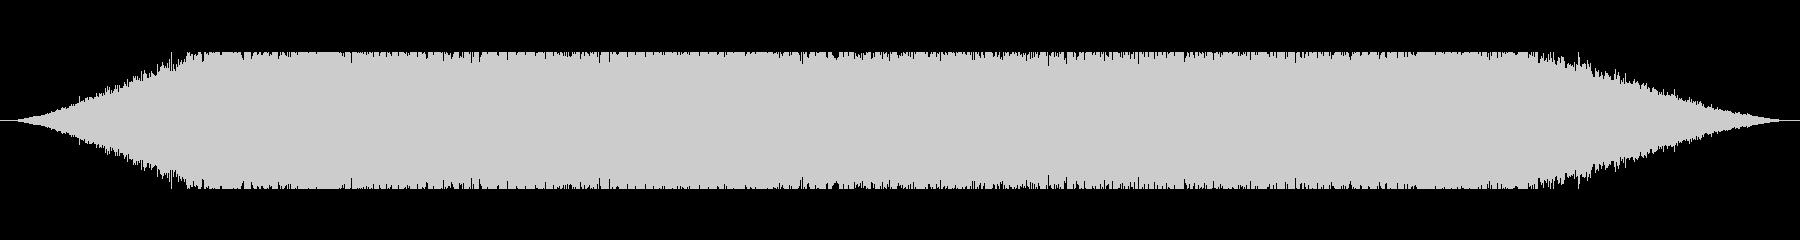 GCMSマシン:IDLING、Em...の未再生の波形